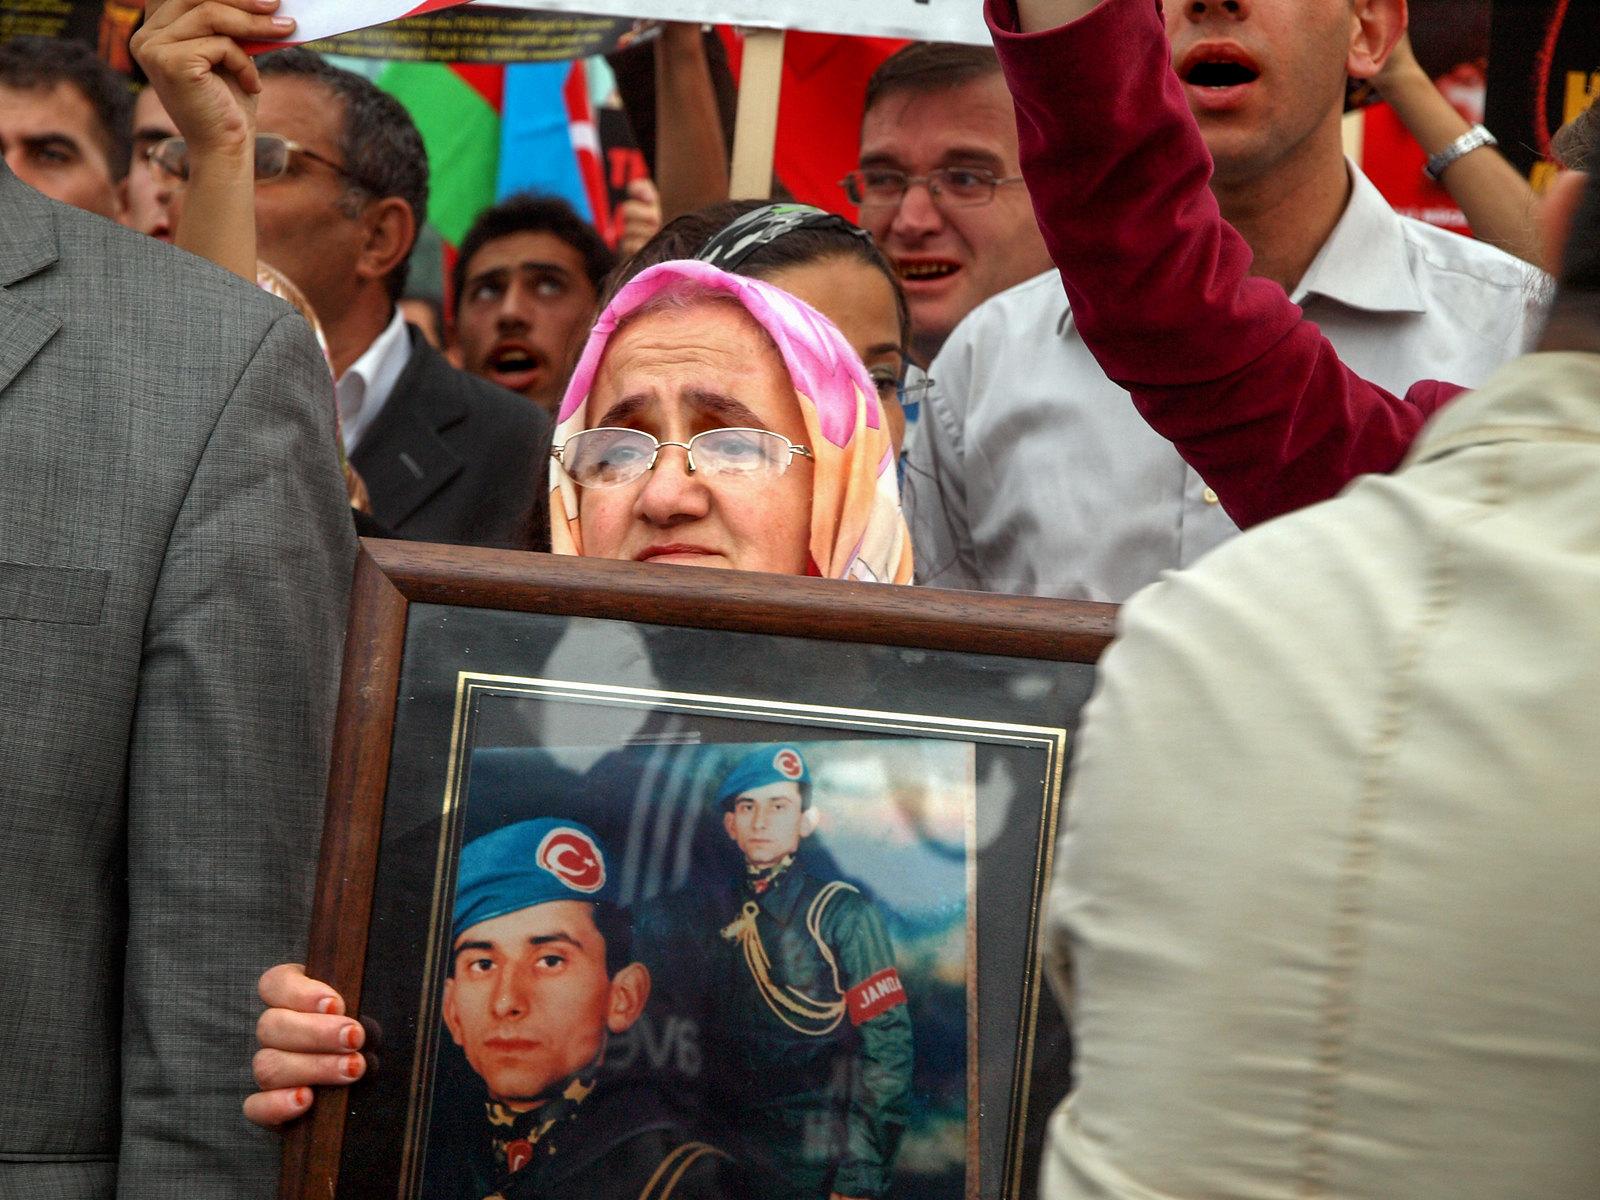 Istanbul - Les manifestants kurdes